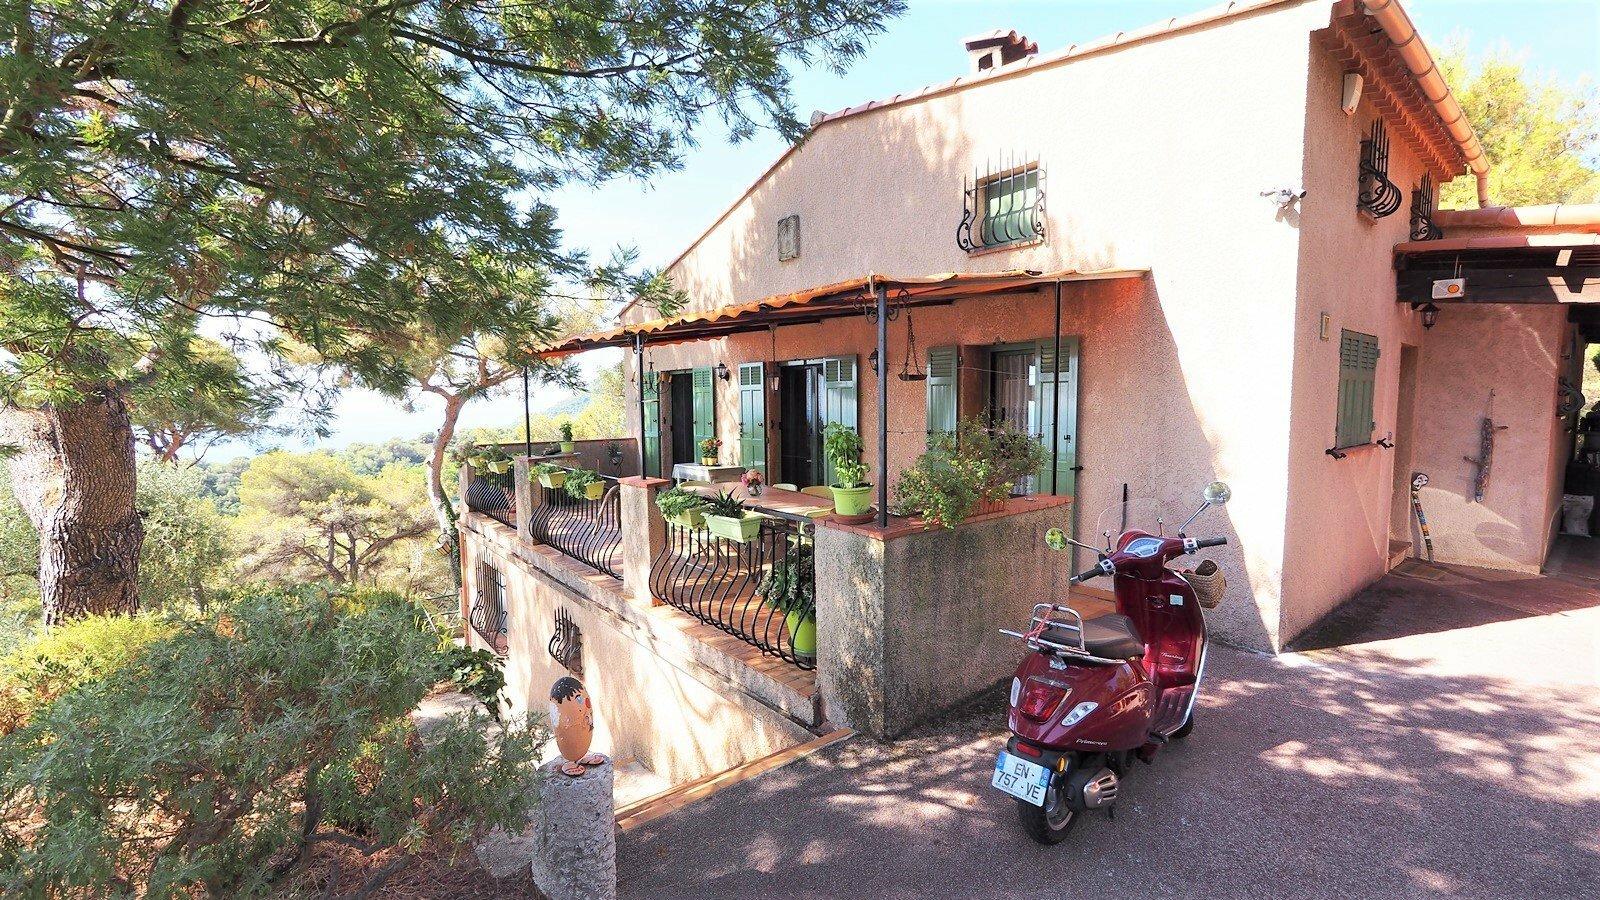 Villa in Beausoleil, Provence-Alpes-Côte d'Azur, France 1